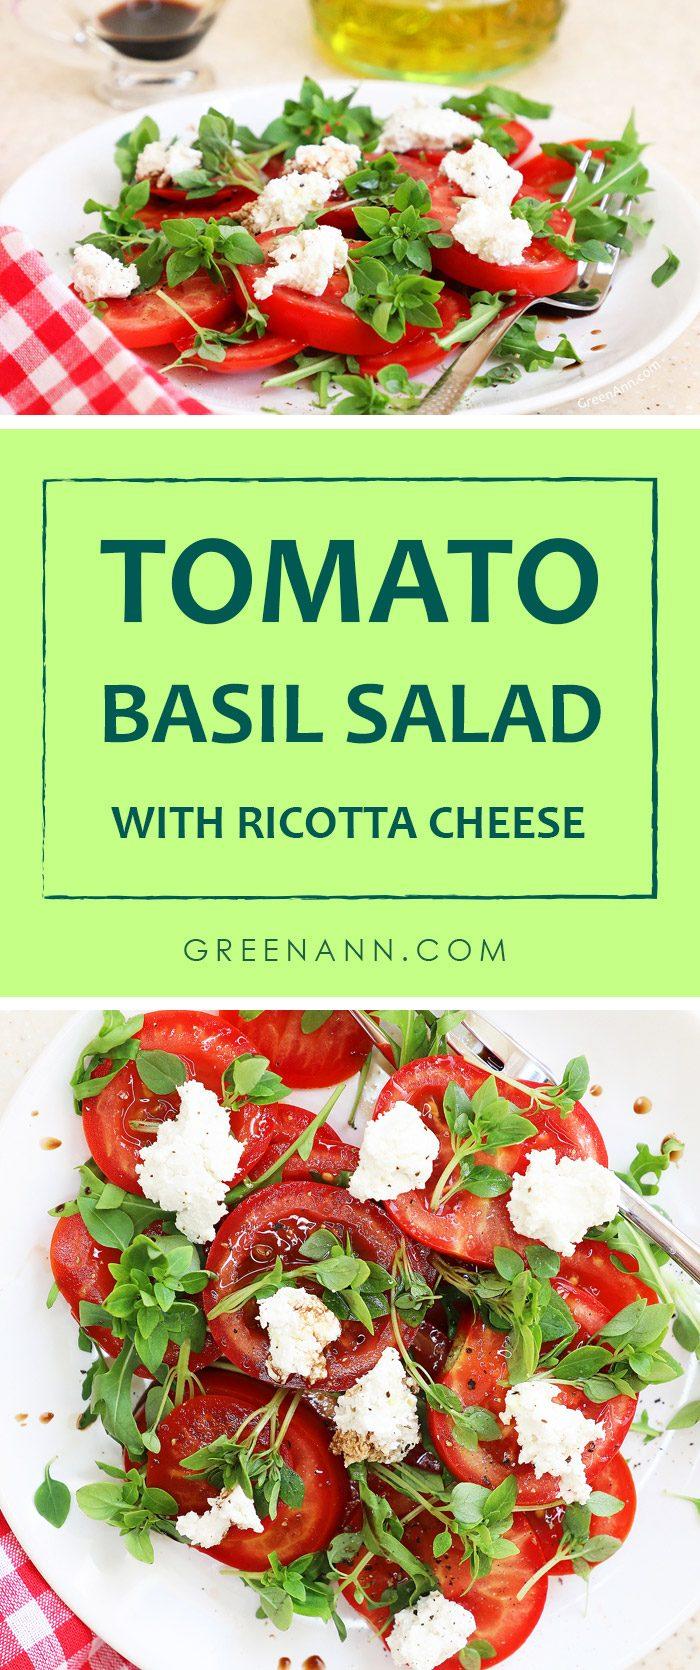 Tomato Basil Salad Recipe